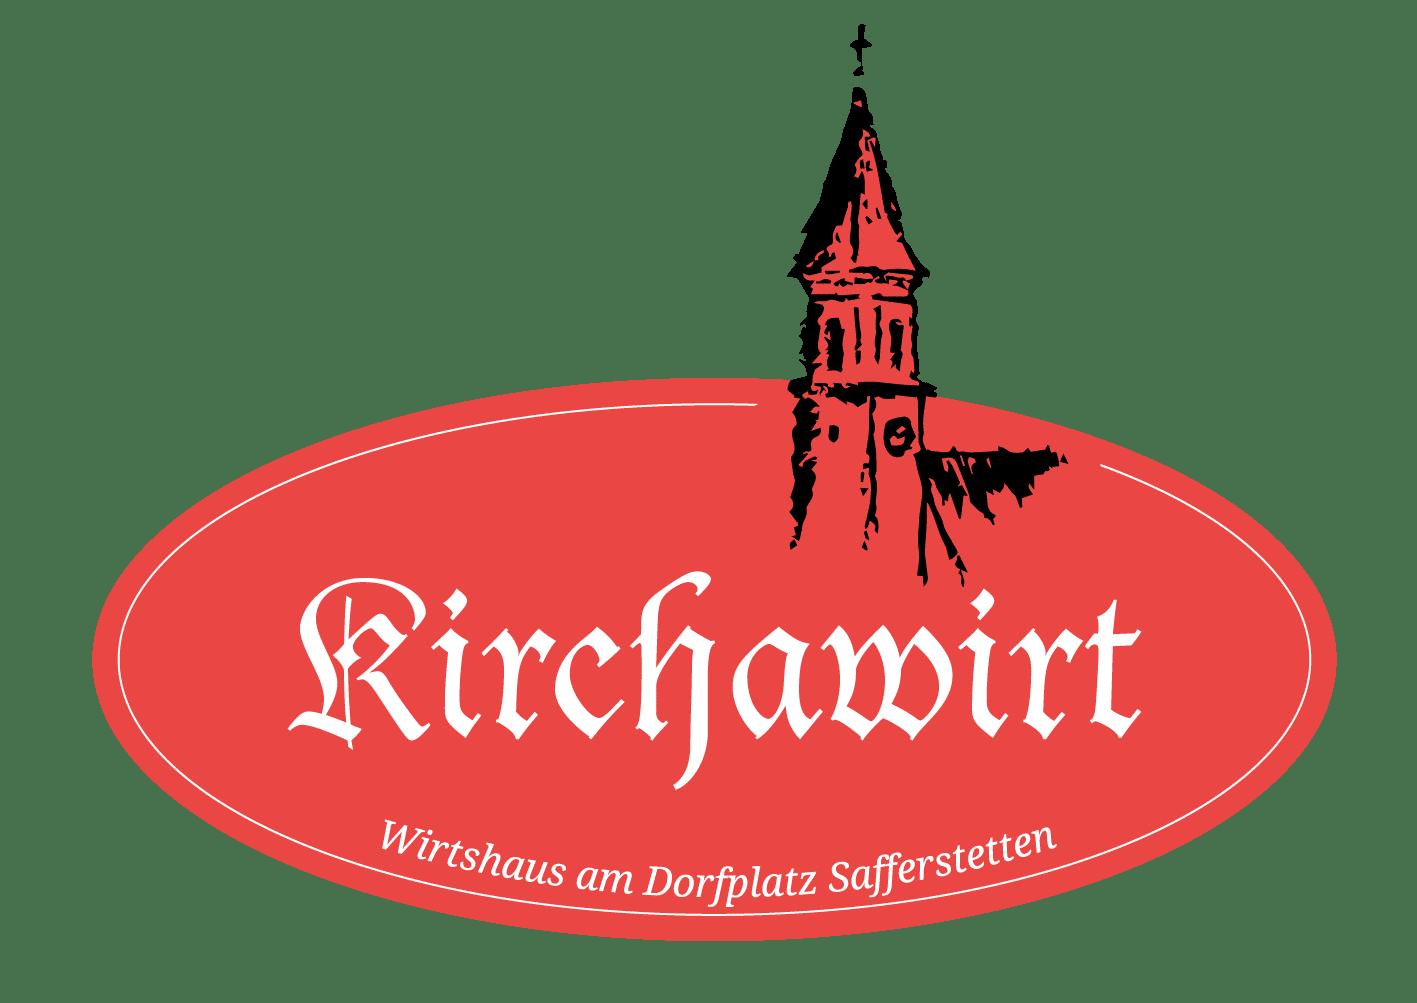 kirchawirt_logo_turm_2015_ROT